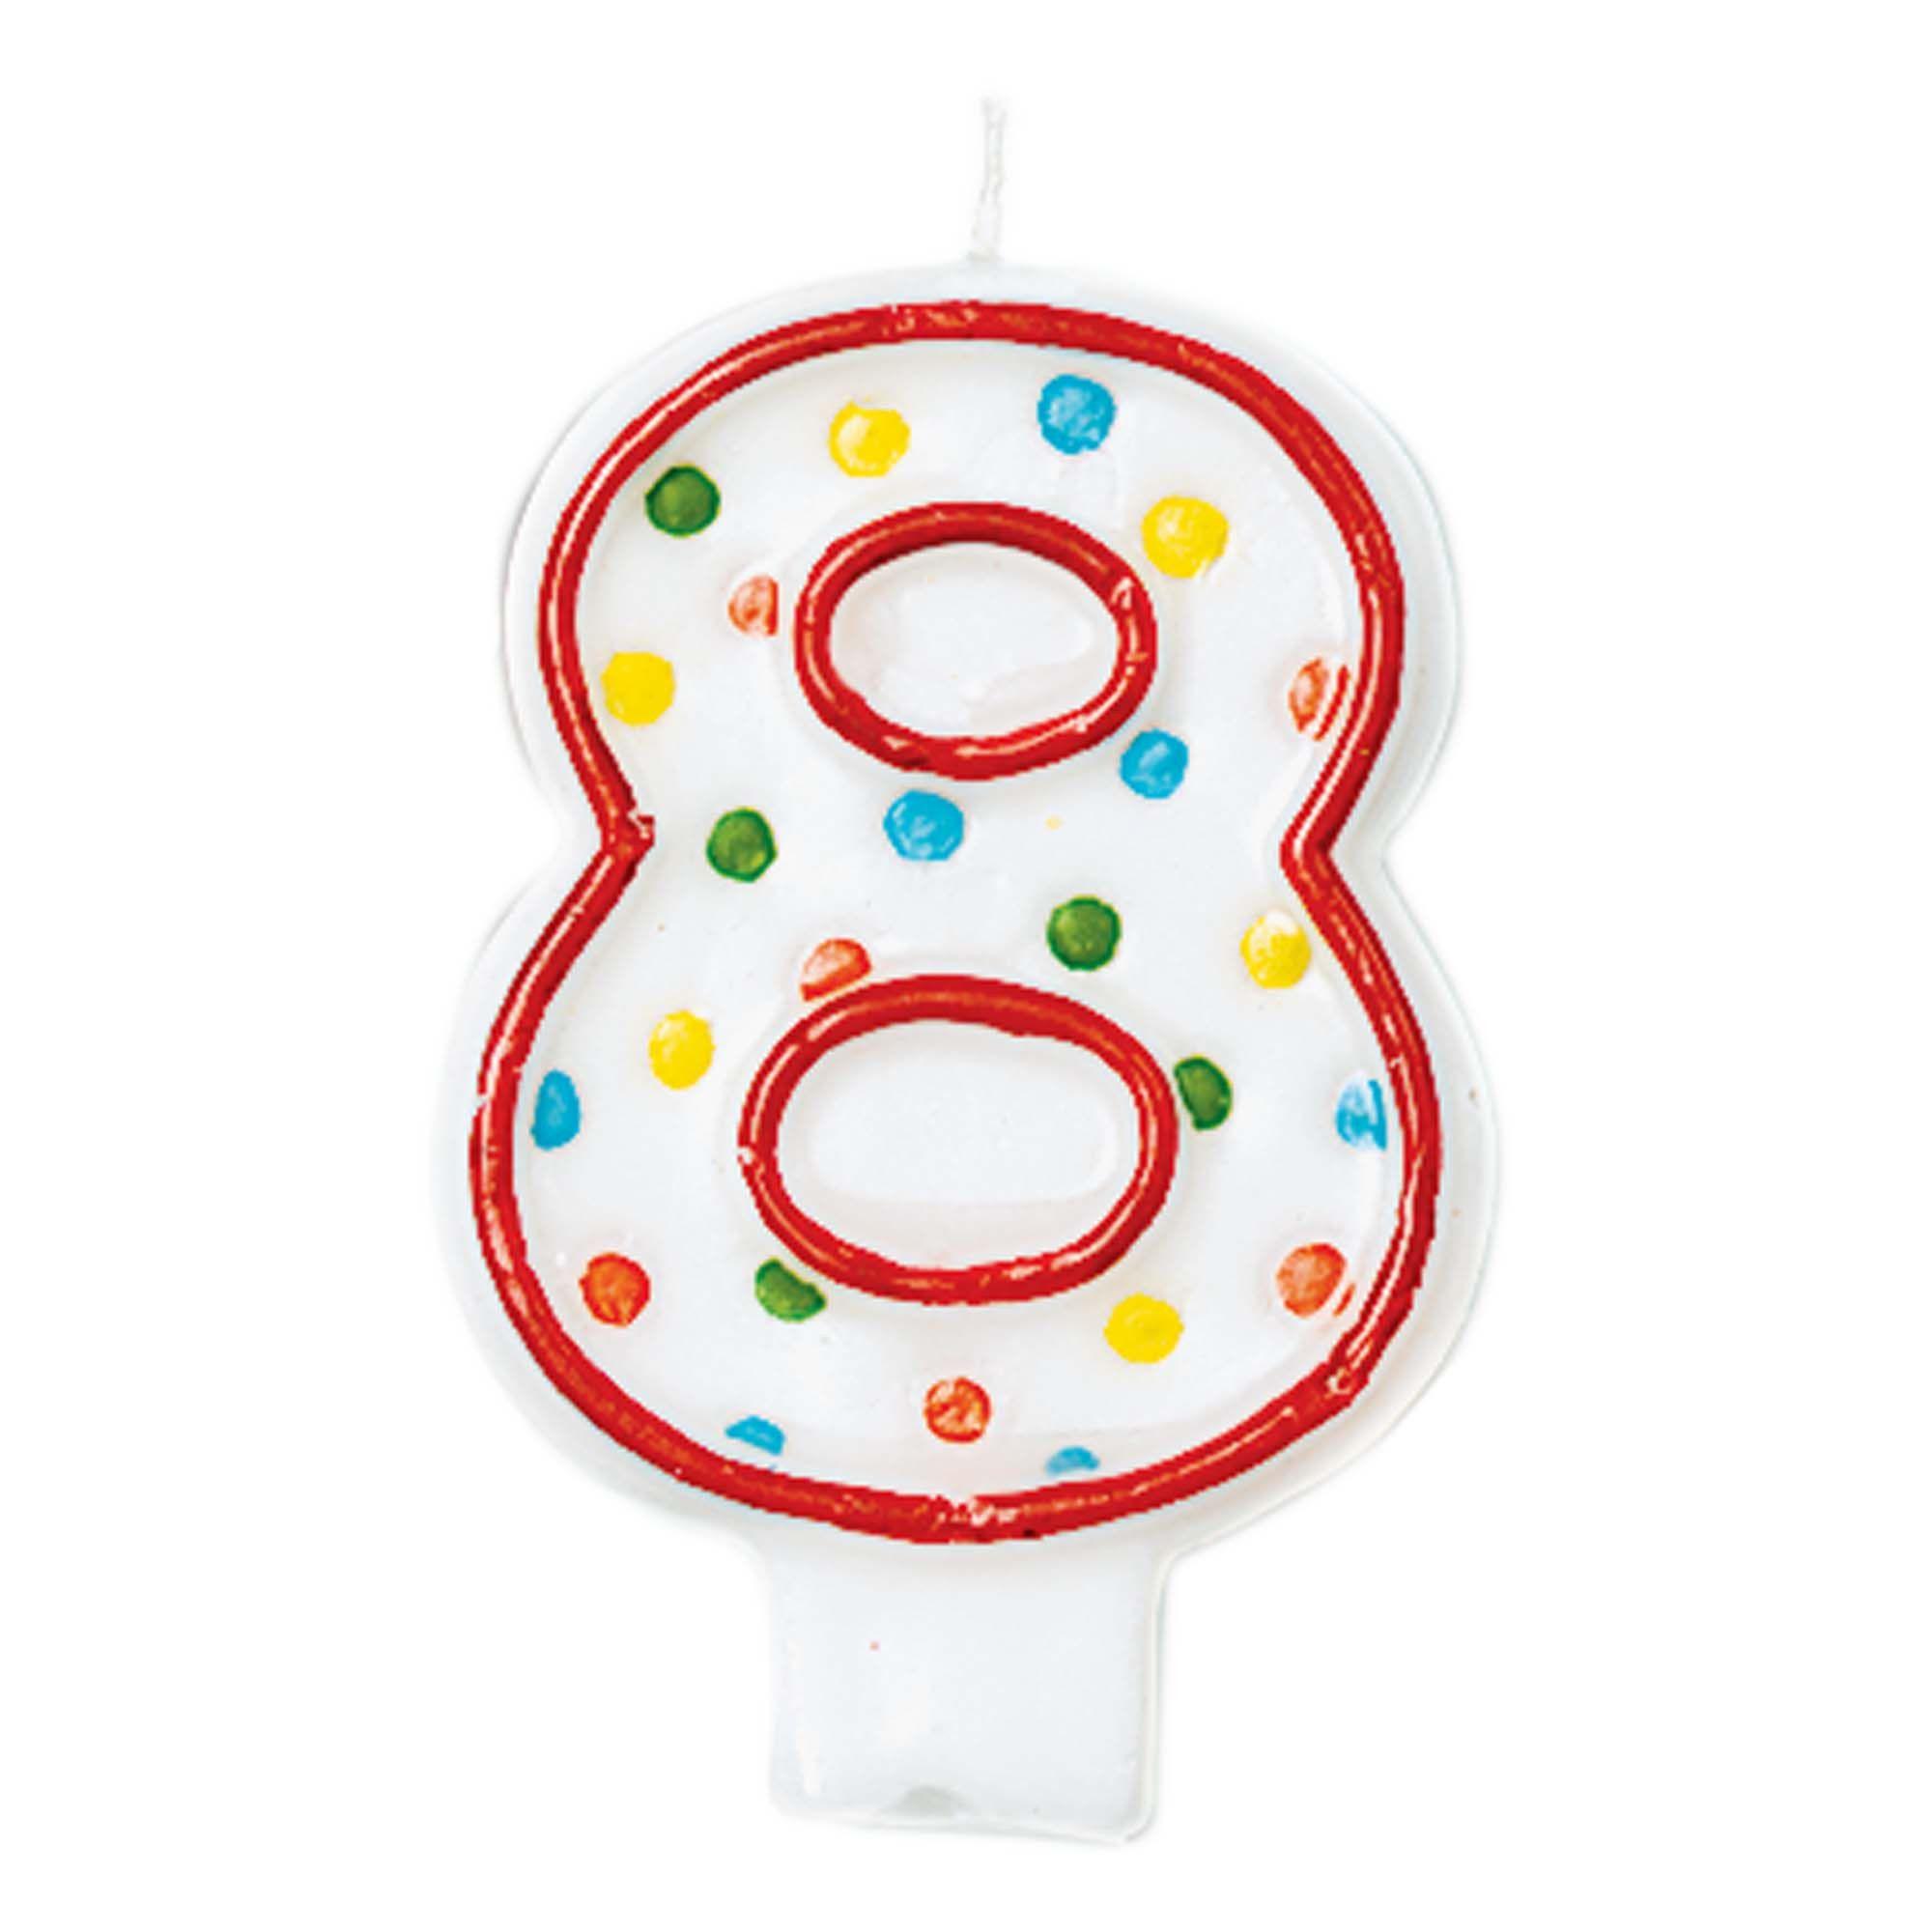 #8 Polka Dot Candle